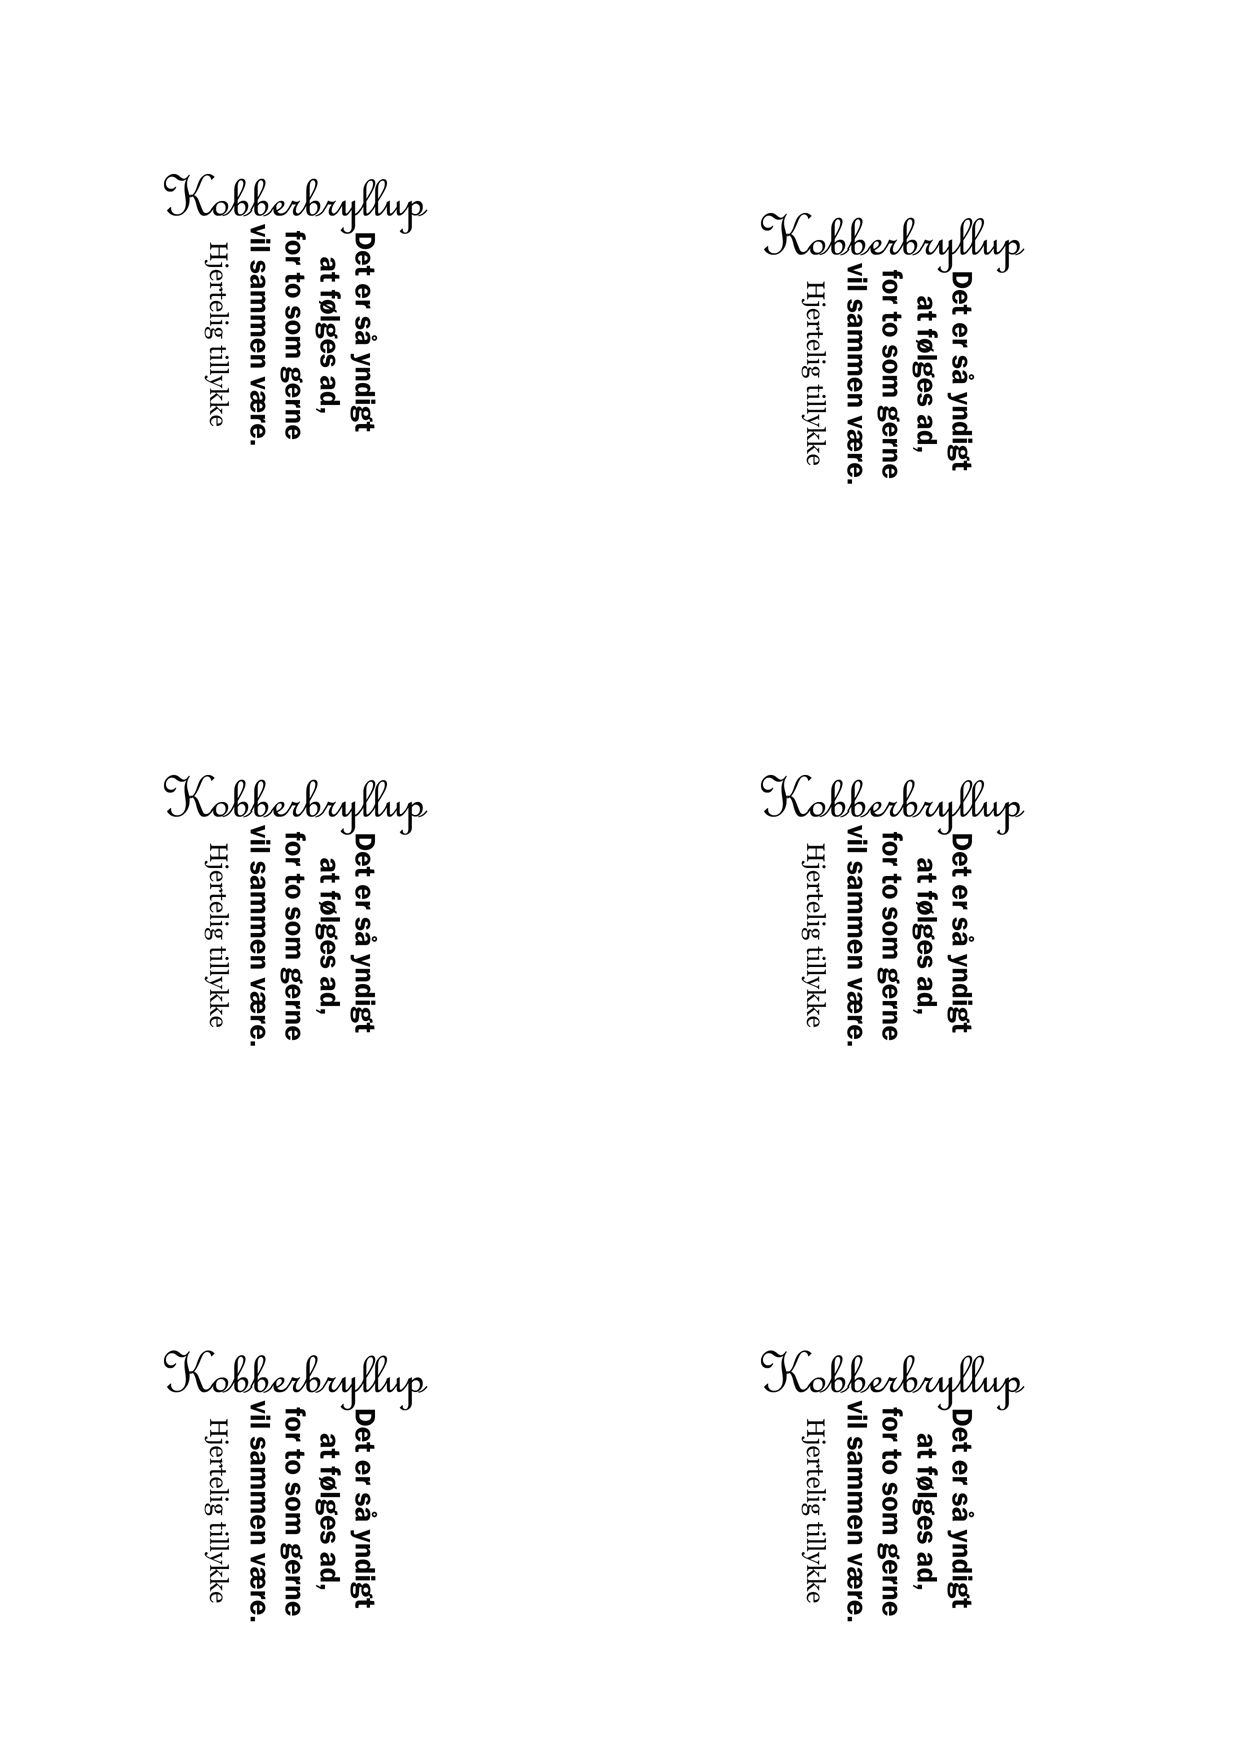 citat til kobberbryllup Kobberbryllup | Tekster | Pinterest citat til kobberbryllup